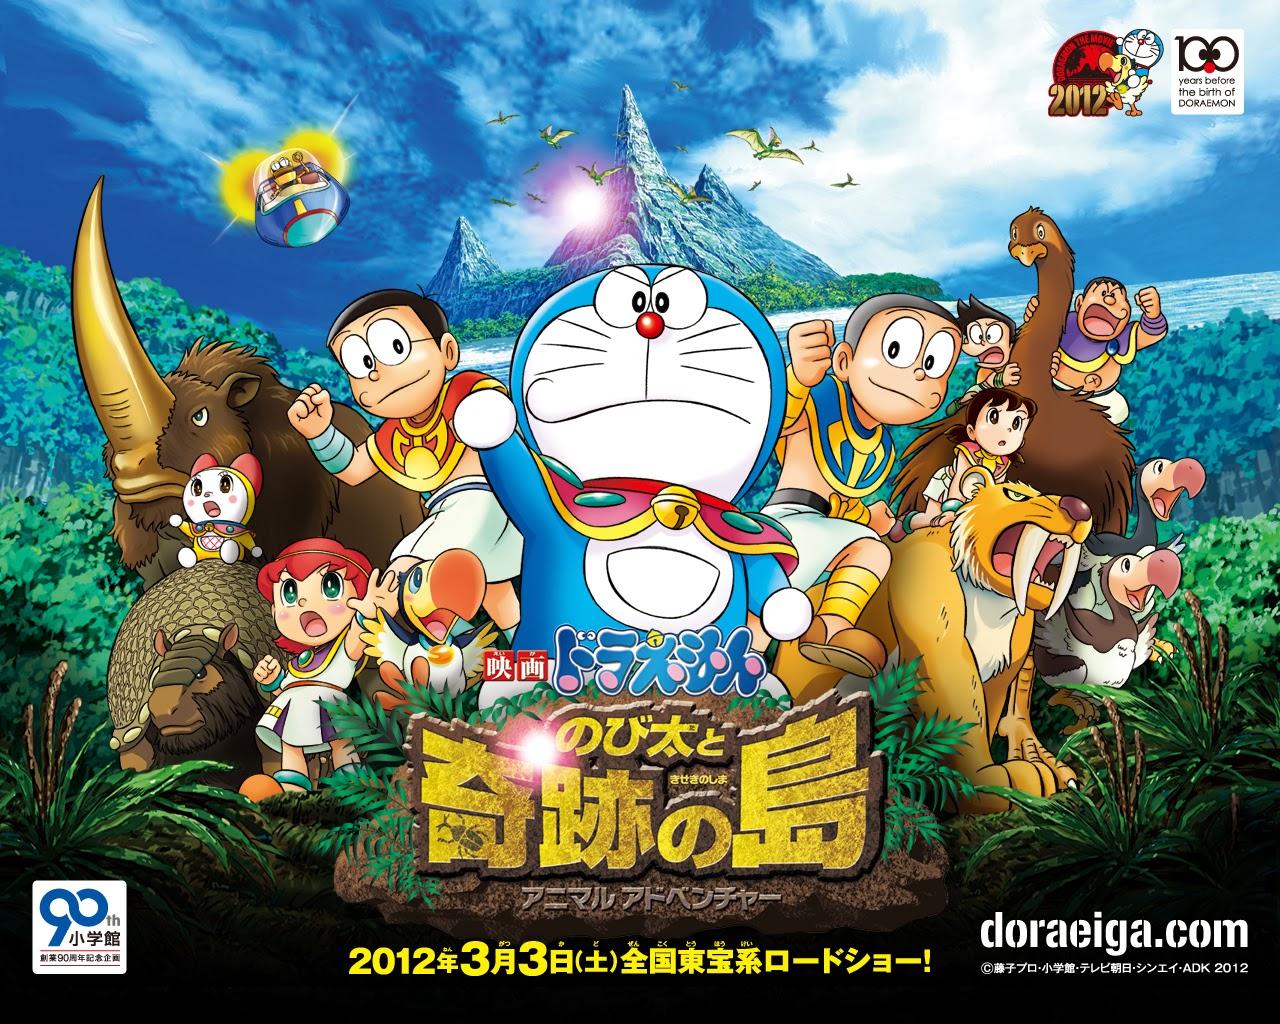 Image gallery for Doraemon The Movie: Nobitas Great